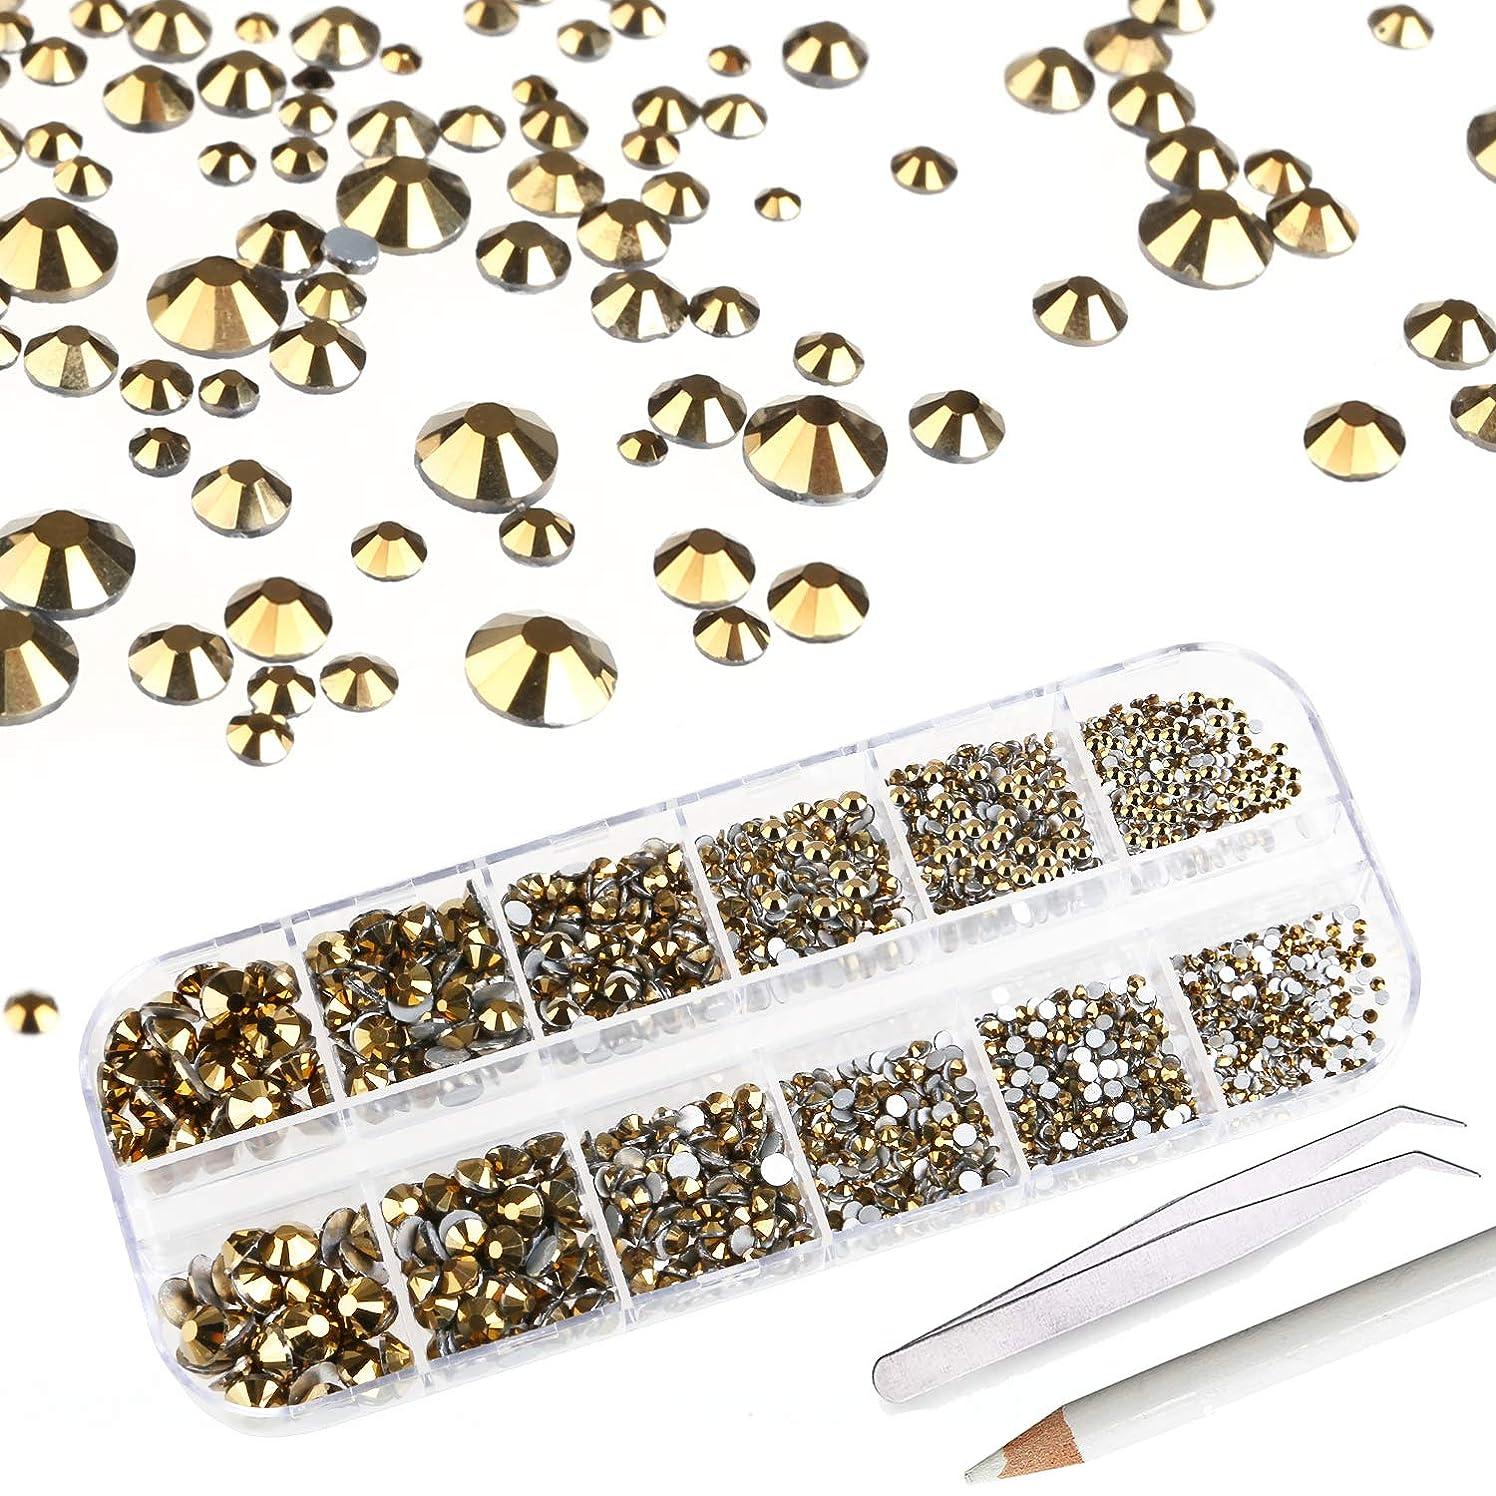 2000+ PCS Rhinestones for Craft,AKWOX Crystals Nail Art Rhinestones Round Beads Flatback Acrylic Charms Gems Stones + Tweezers + Picking Pencil with Storage Organizer Box,6 Sizes(2-5 mm)-Gold